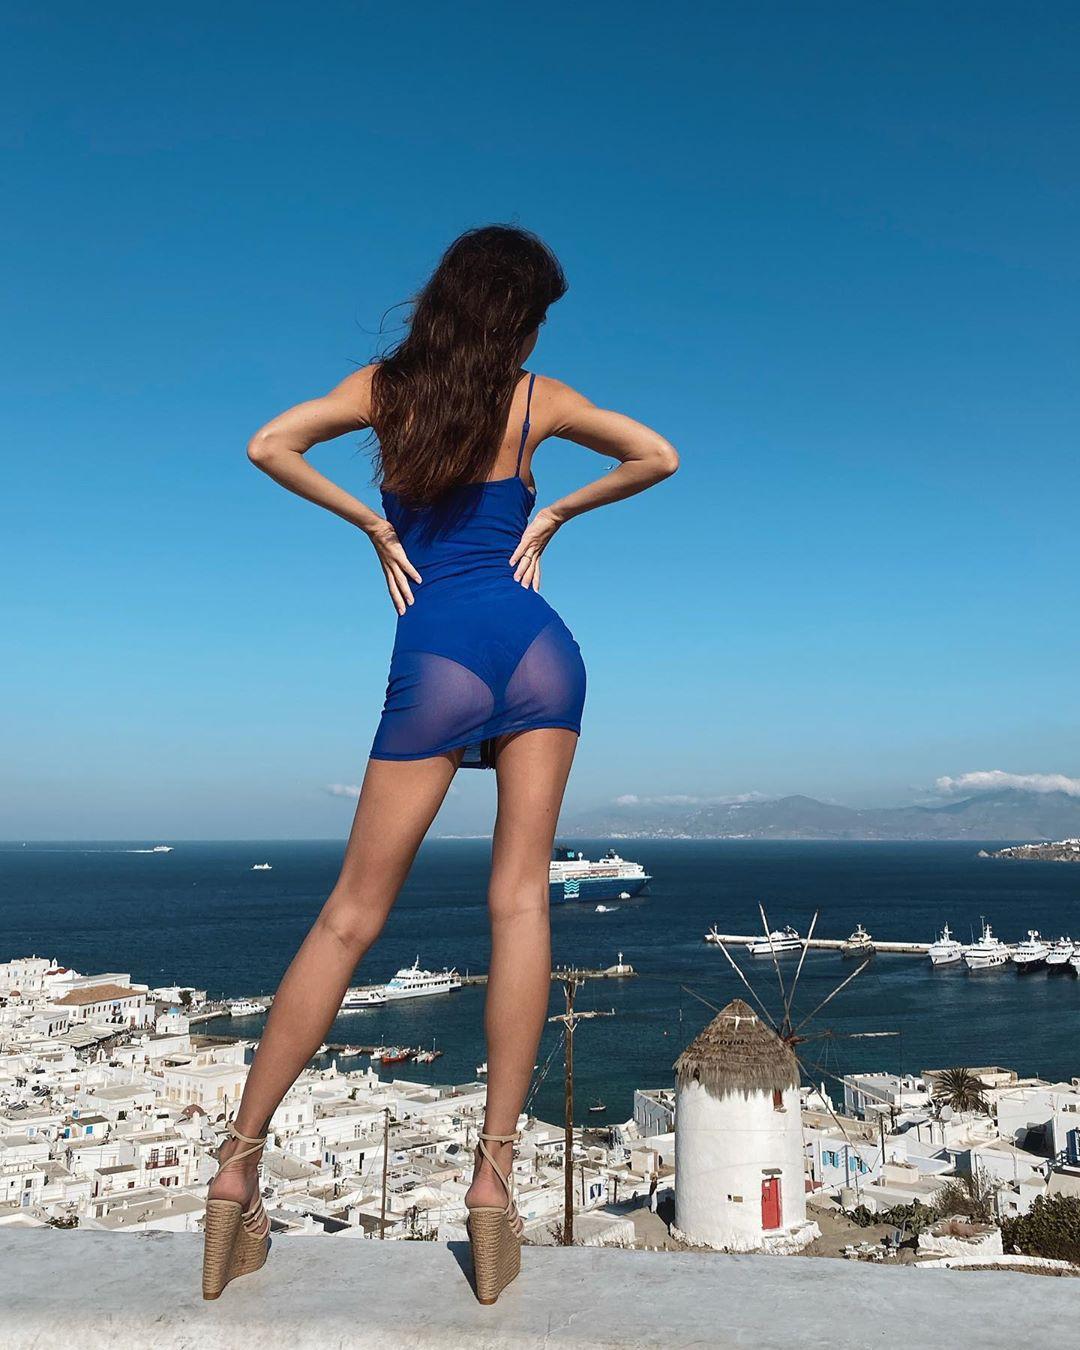 Ekaterina Zueva best photoshoot ideas, smooth thigh pics, hot legs